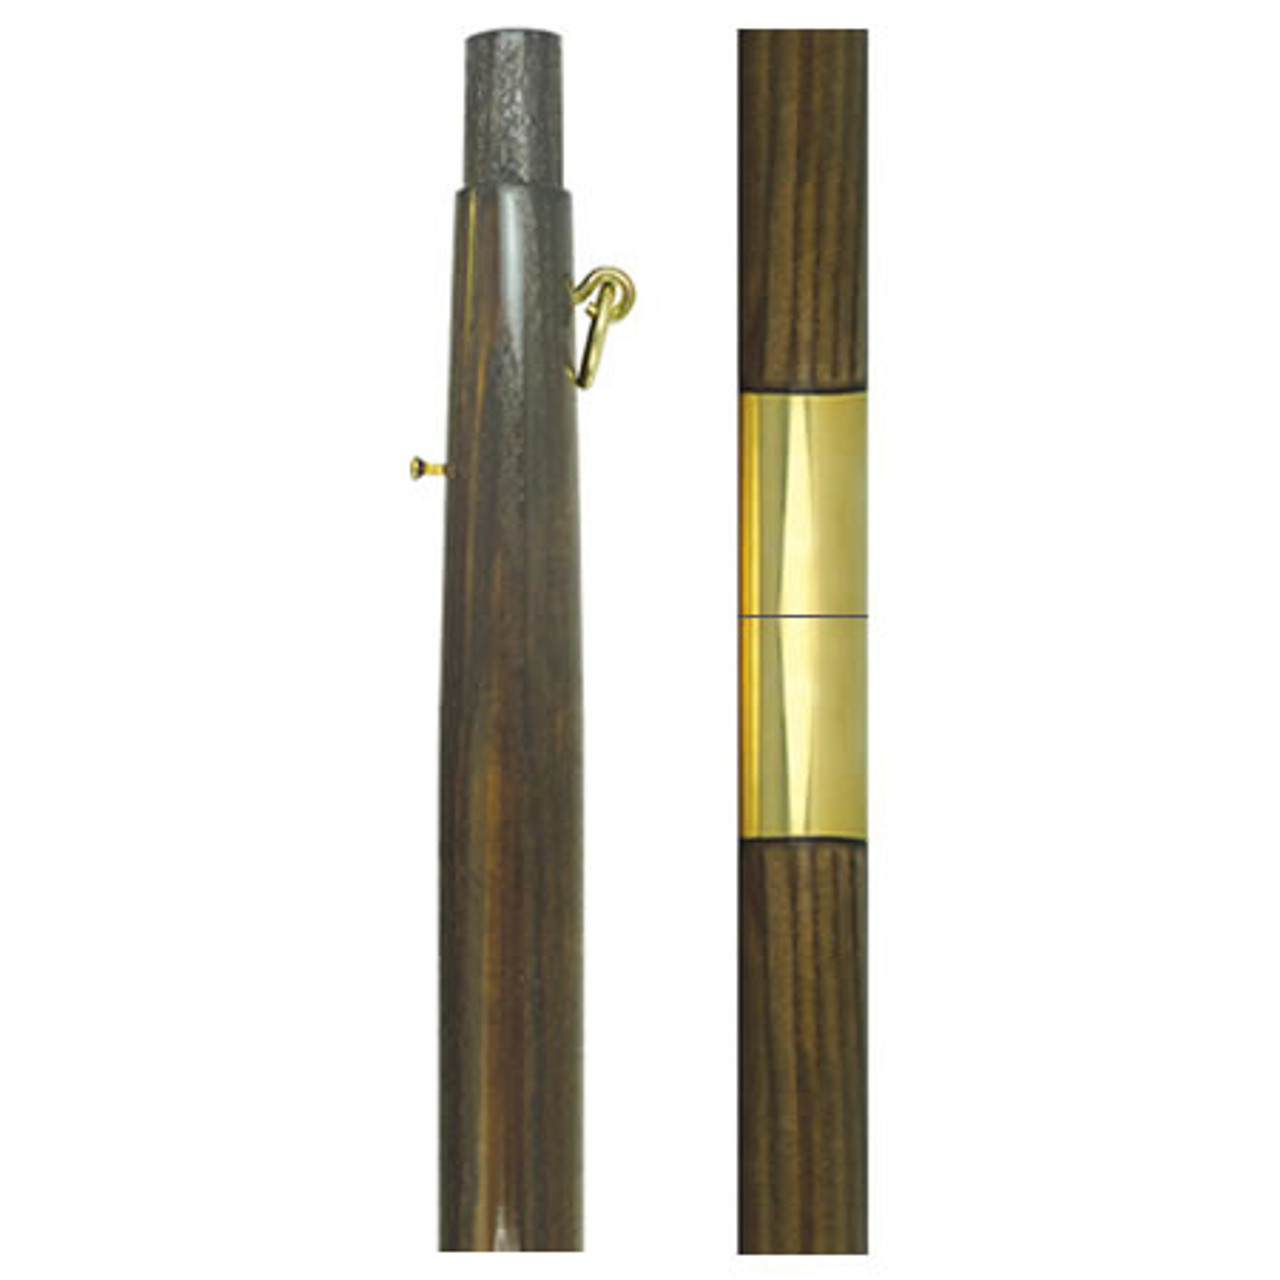 Dark Oak Wooden Indoor Poles Parade Poles